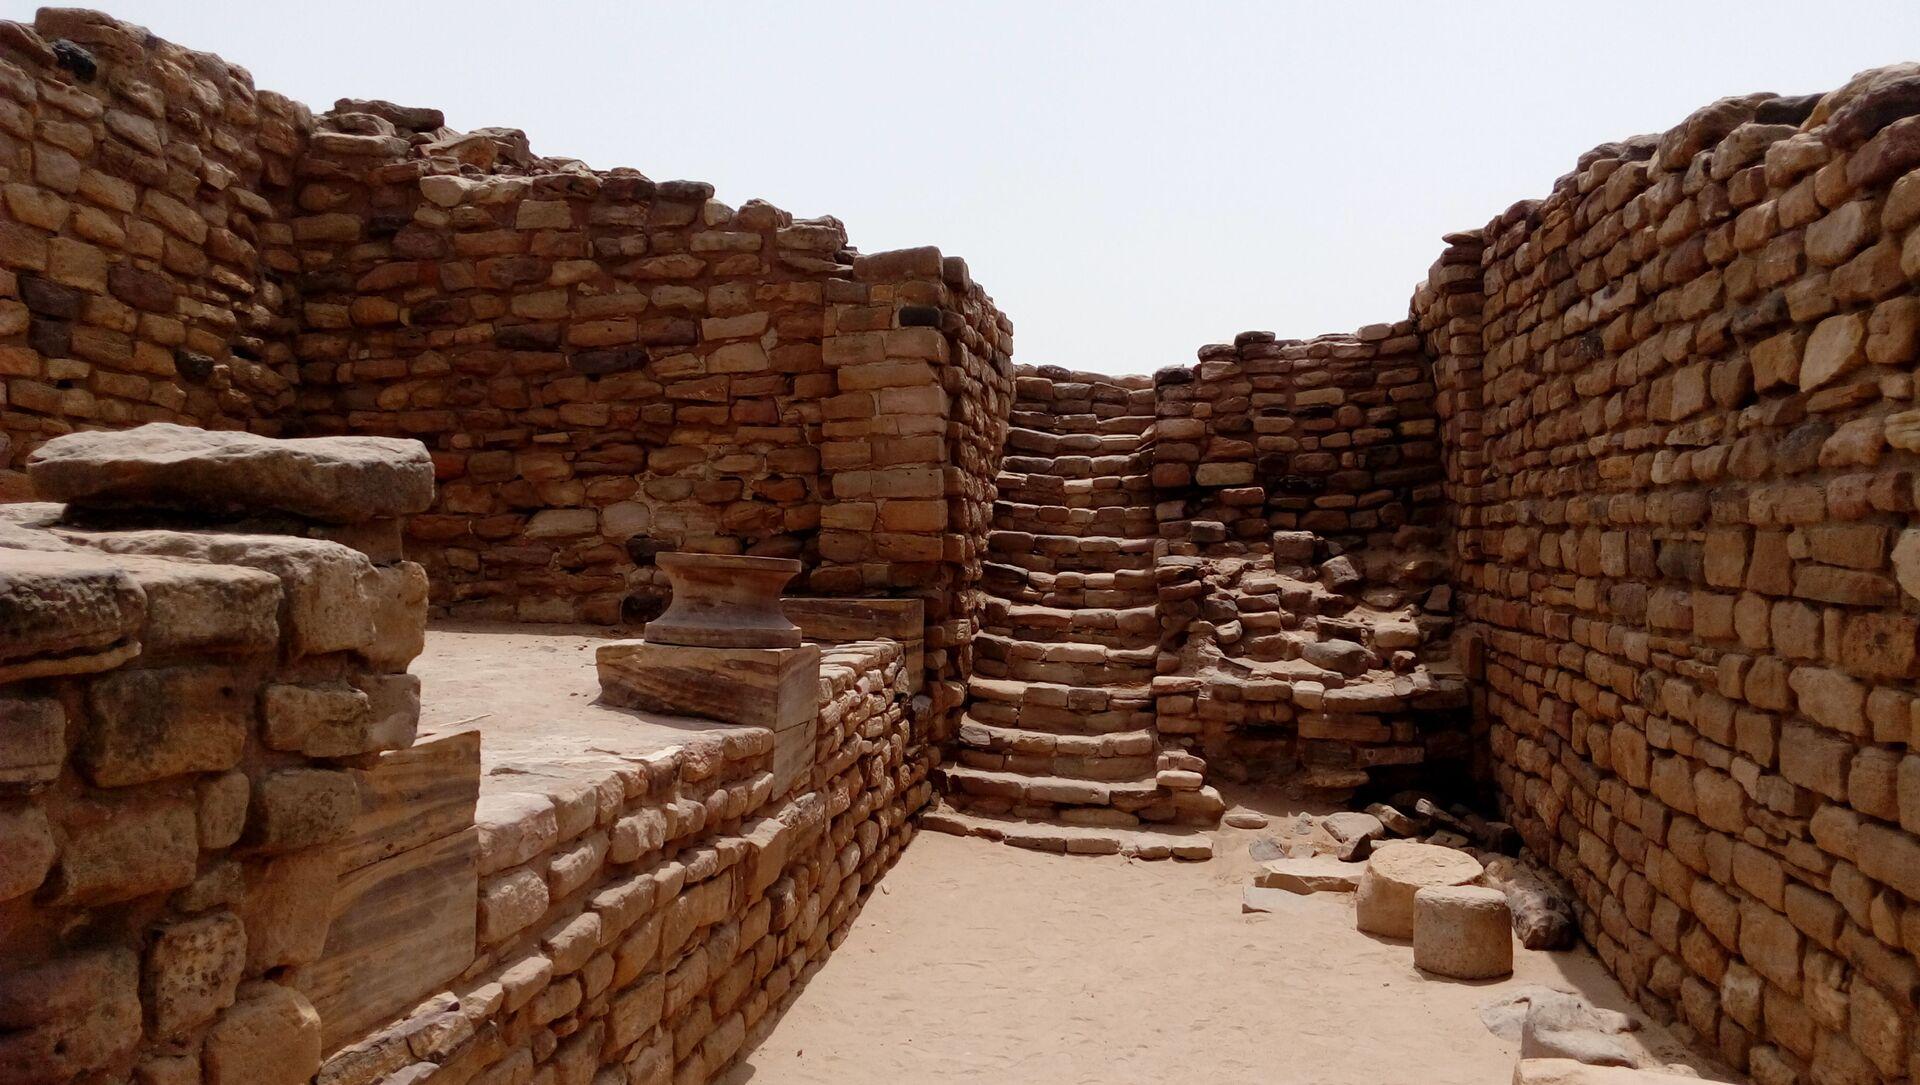 East Gate of Dholavira, Indus Valley Civilization site in Gujarat, India - Sputnik International, 1920, 27.07.2021